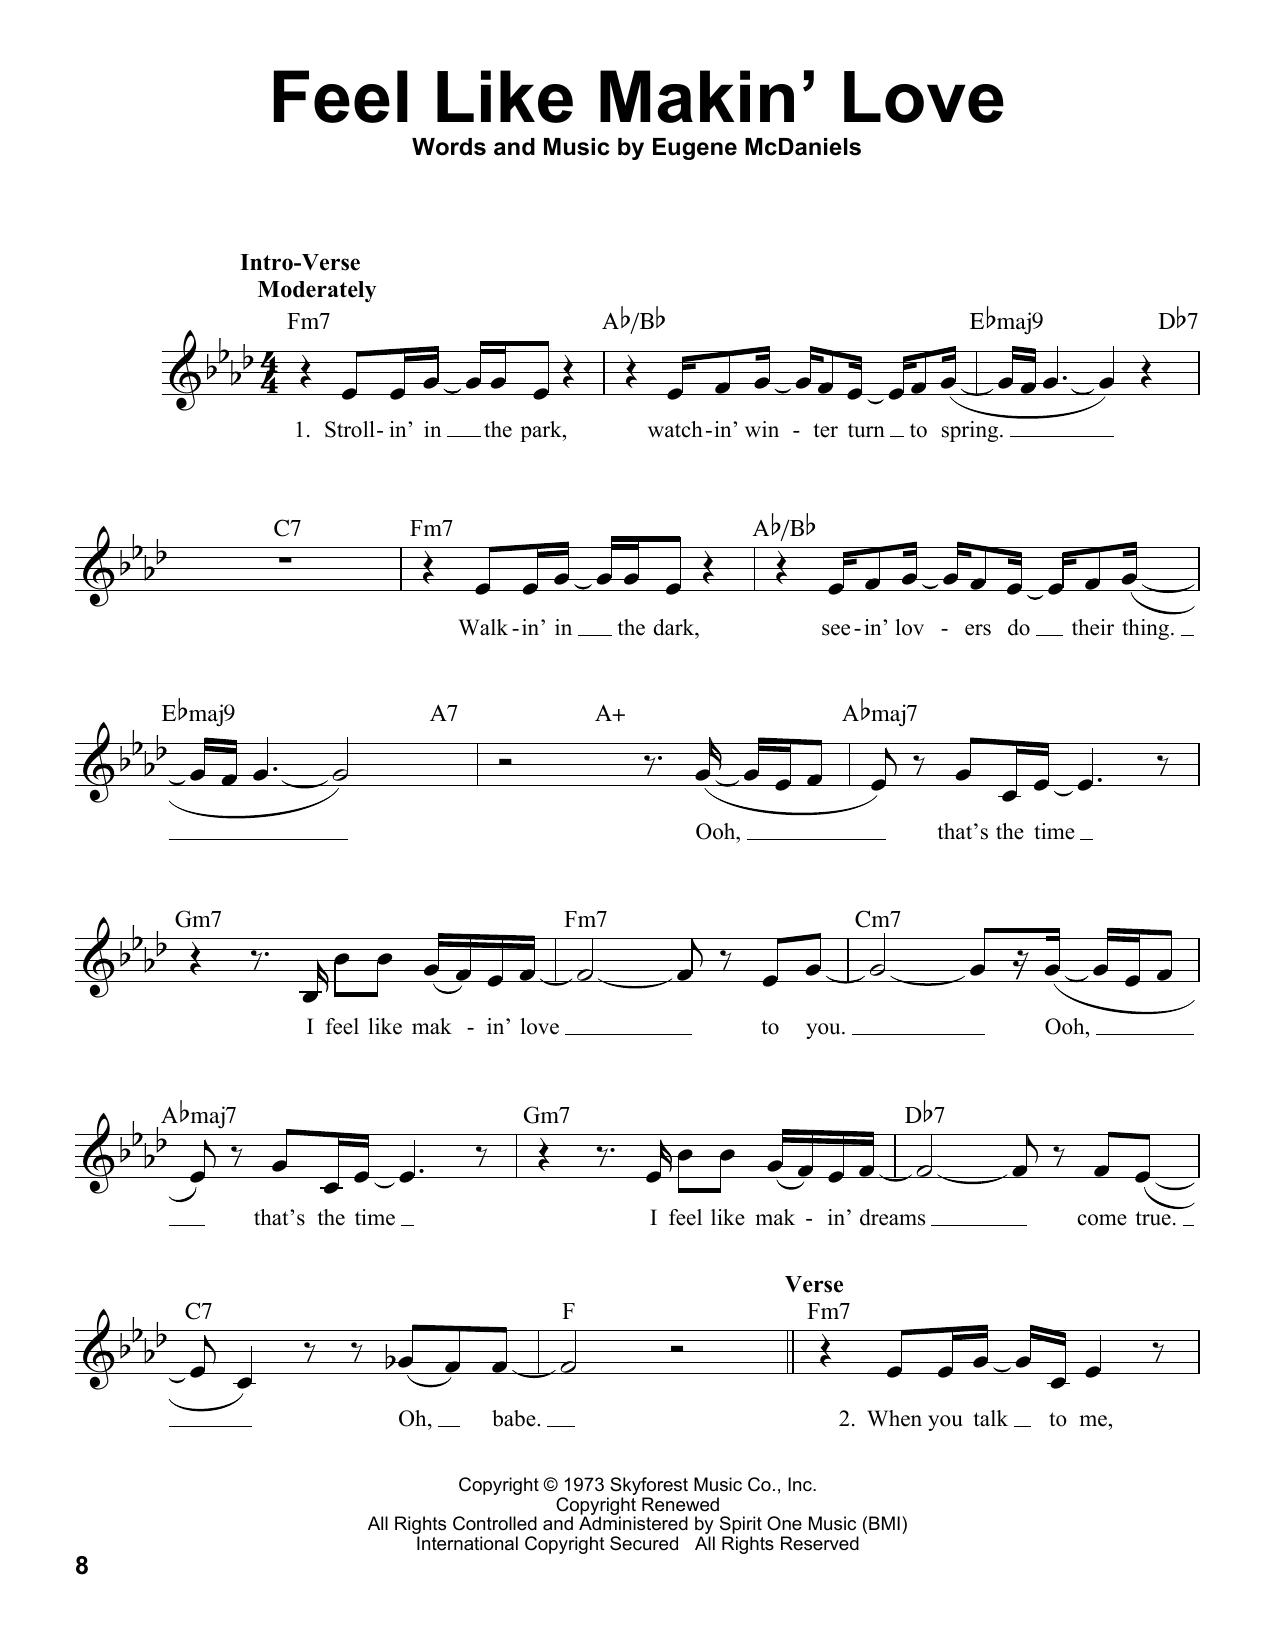 Sheet Music Digital Files To Print Licensed Dangelo Digital Sheet